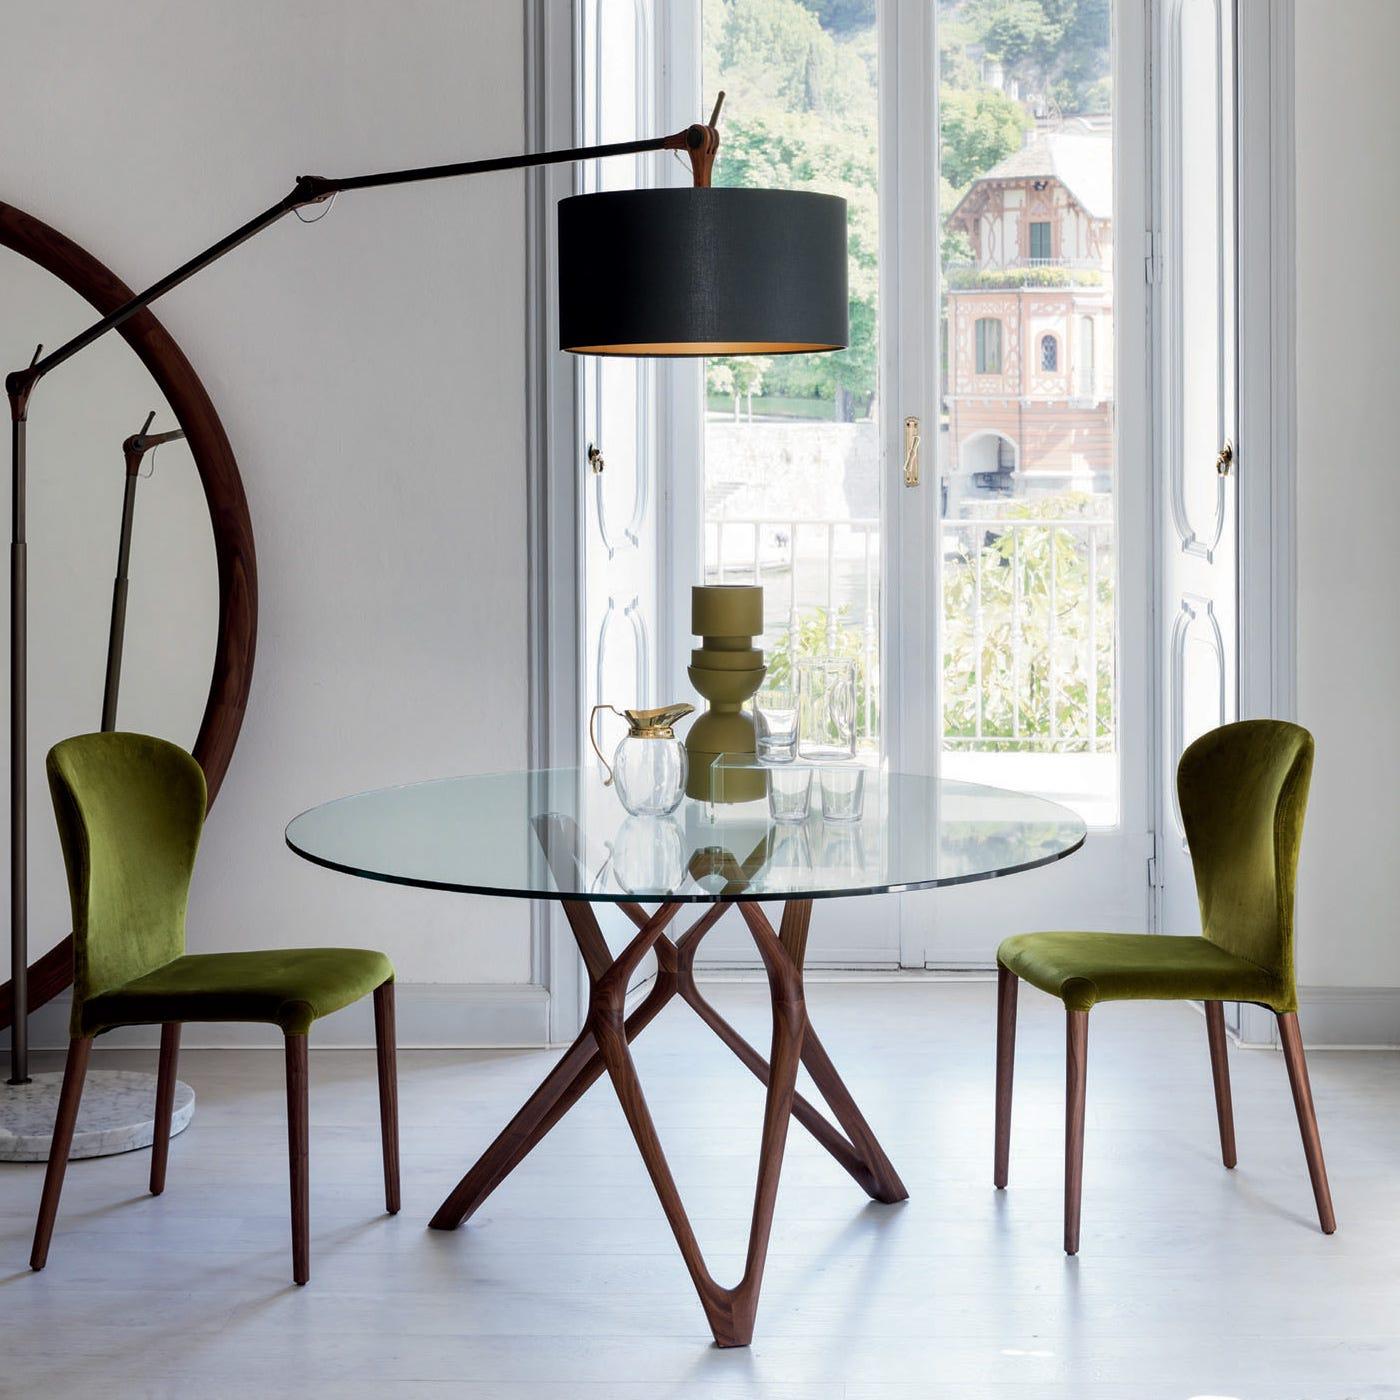 Big table lamp light database light ideas gary big floor lamp walnut marble base aloadofball Gallery